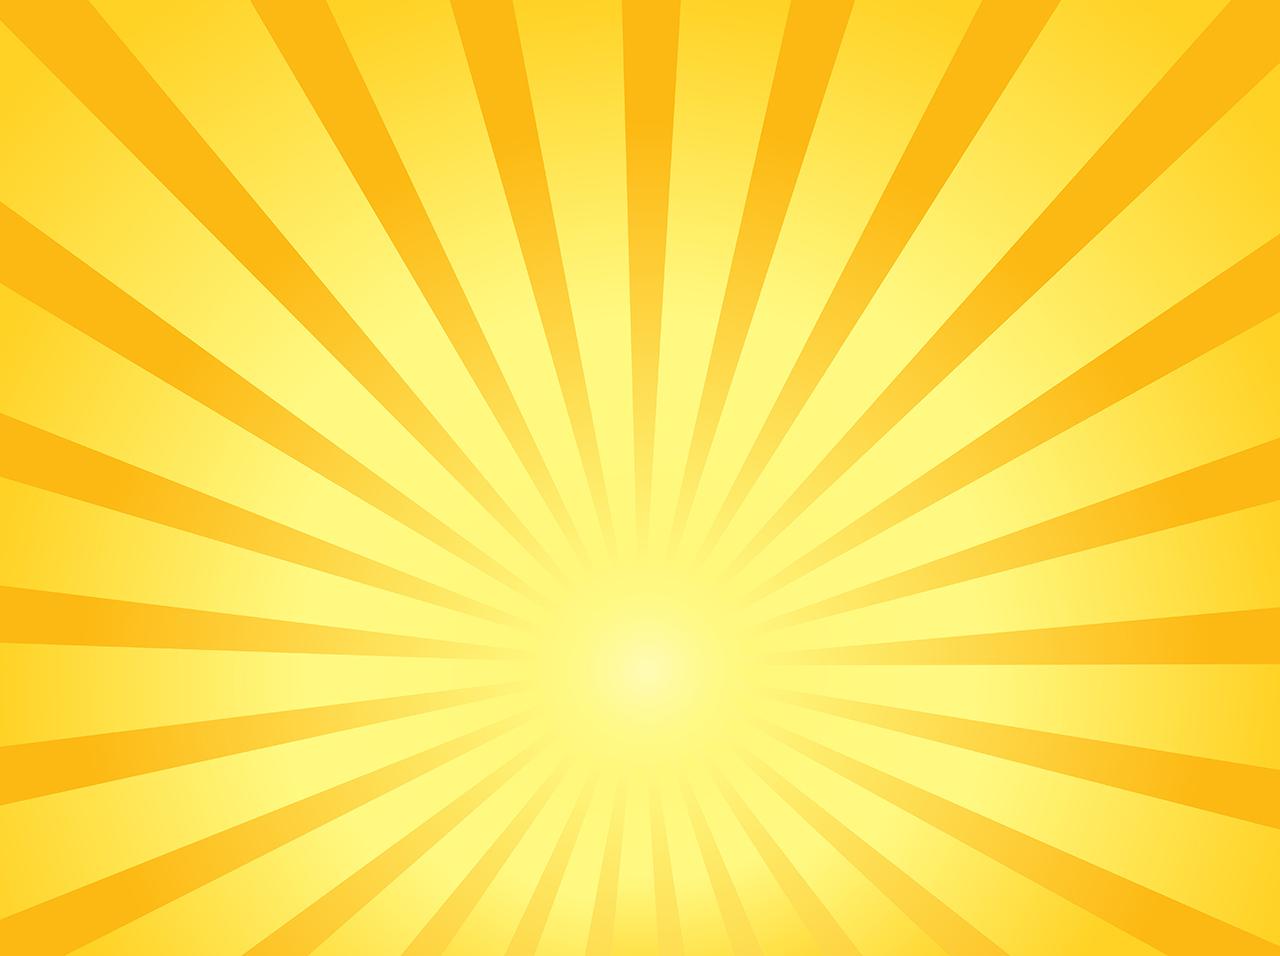 Drawn sun beams